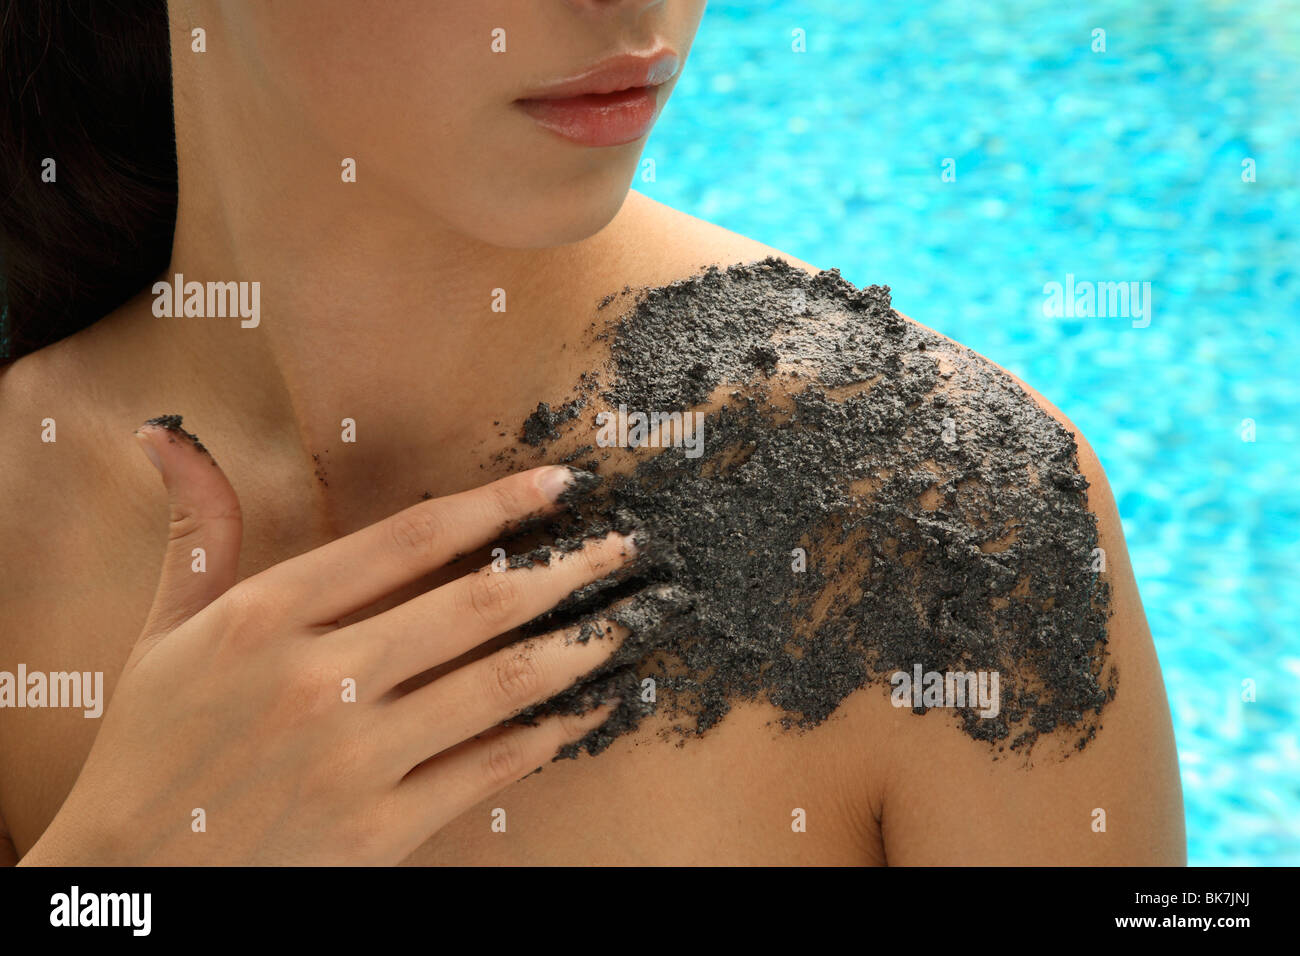 L'application sesame de la piscine traitement scrub&#10, Photo Stock